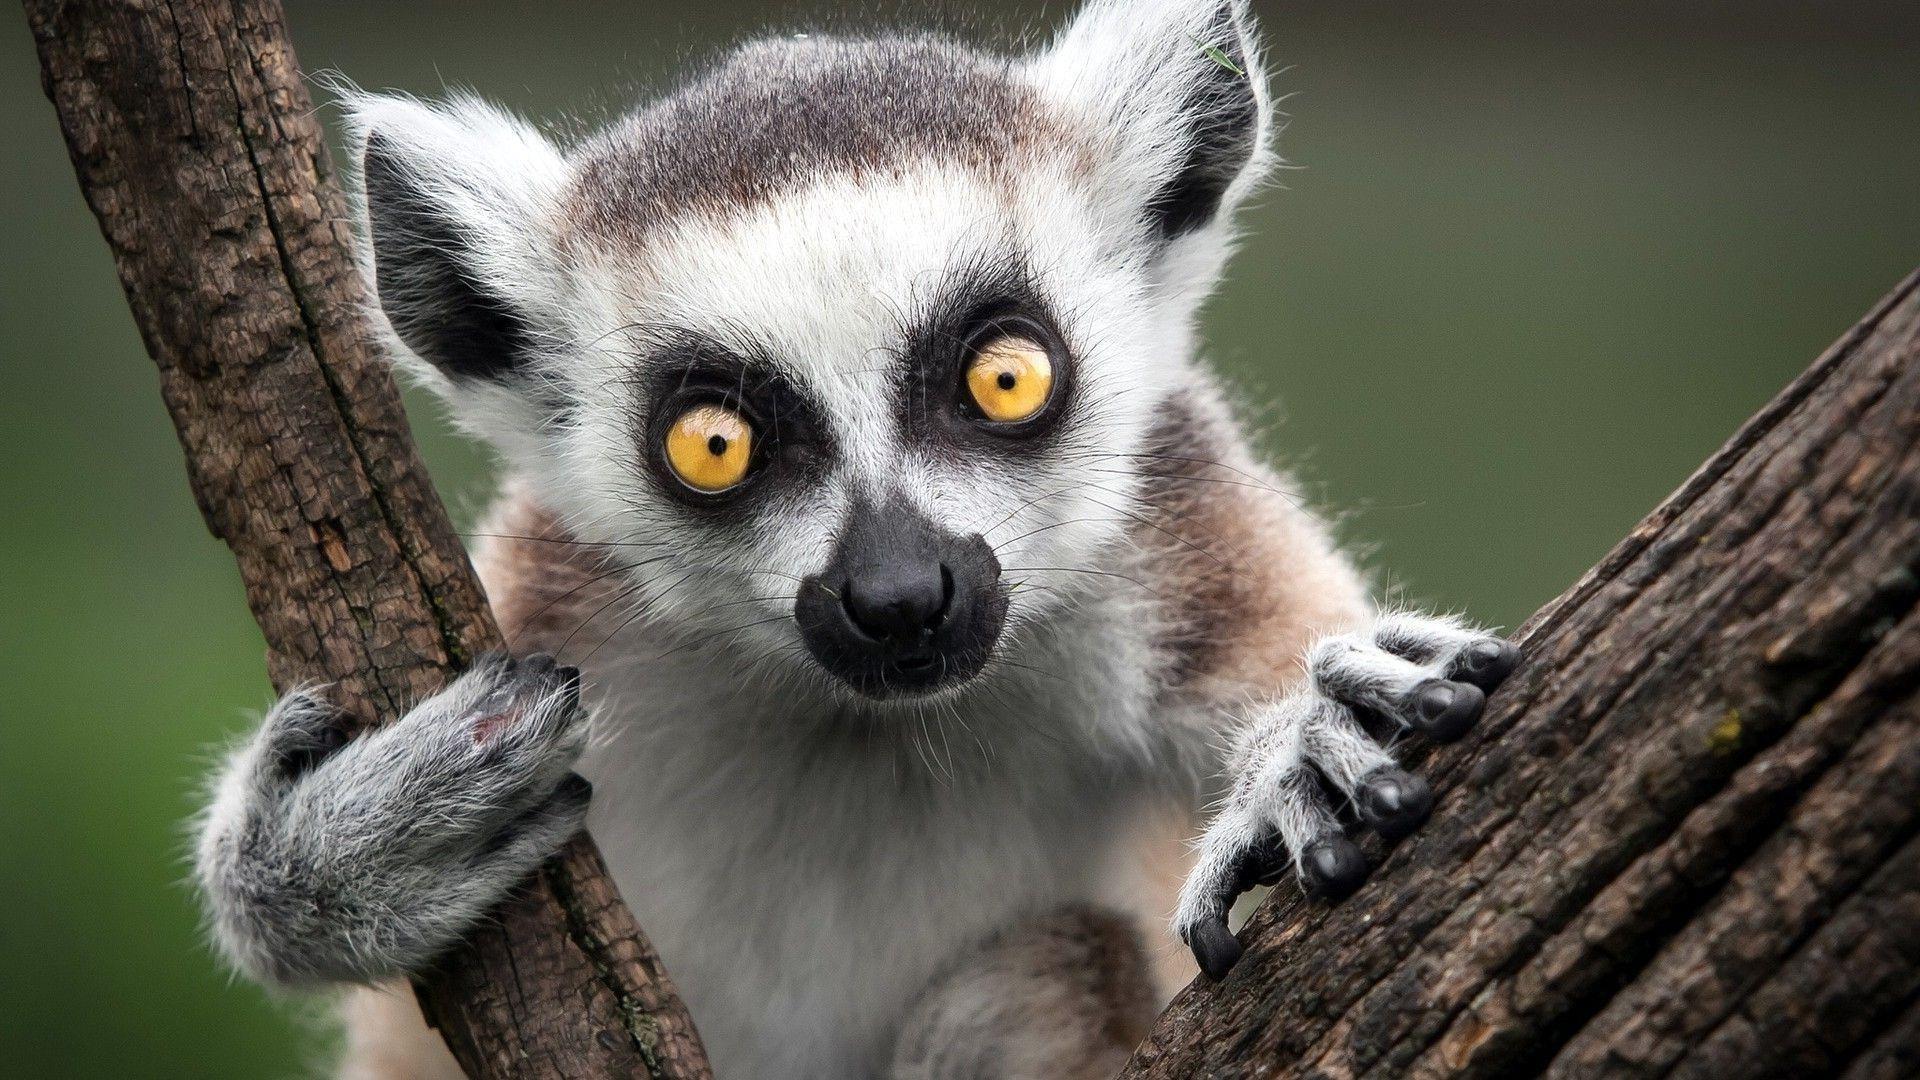 Res: 1920x1080, Lemur Wallpapers 5 - 1920 X 1080